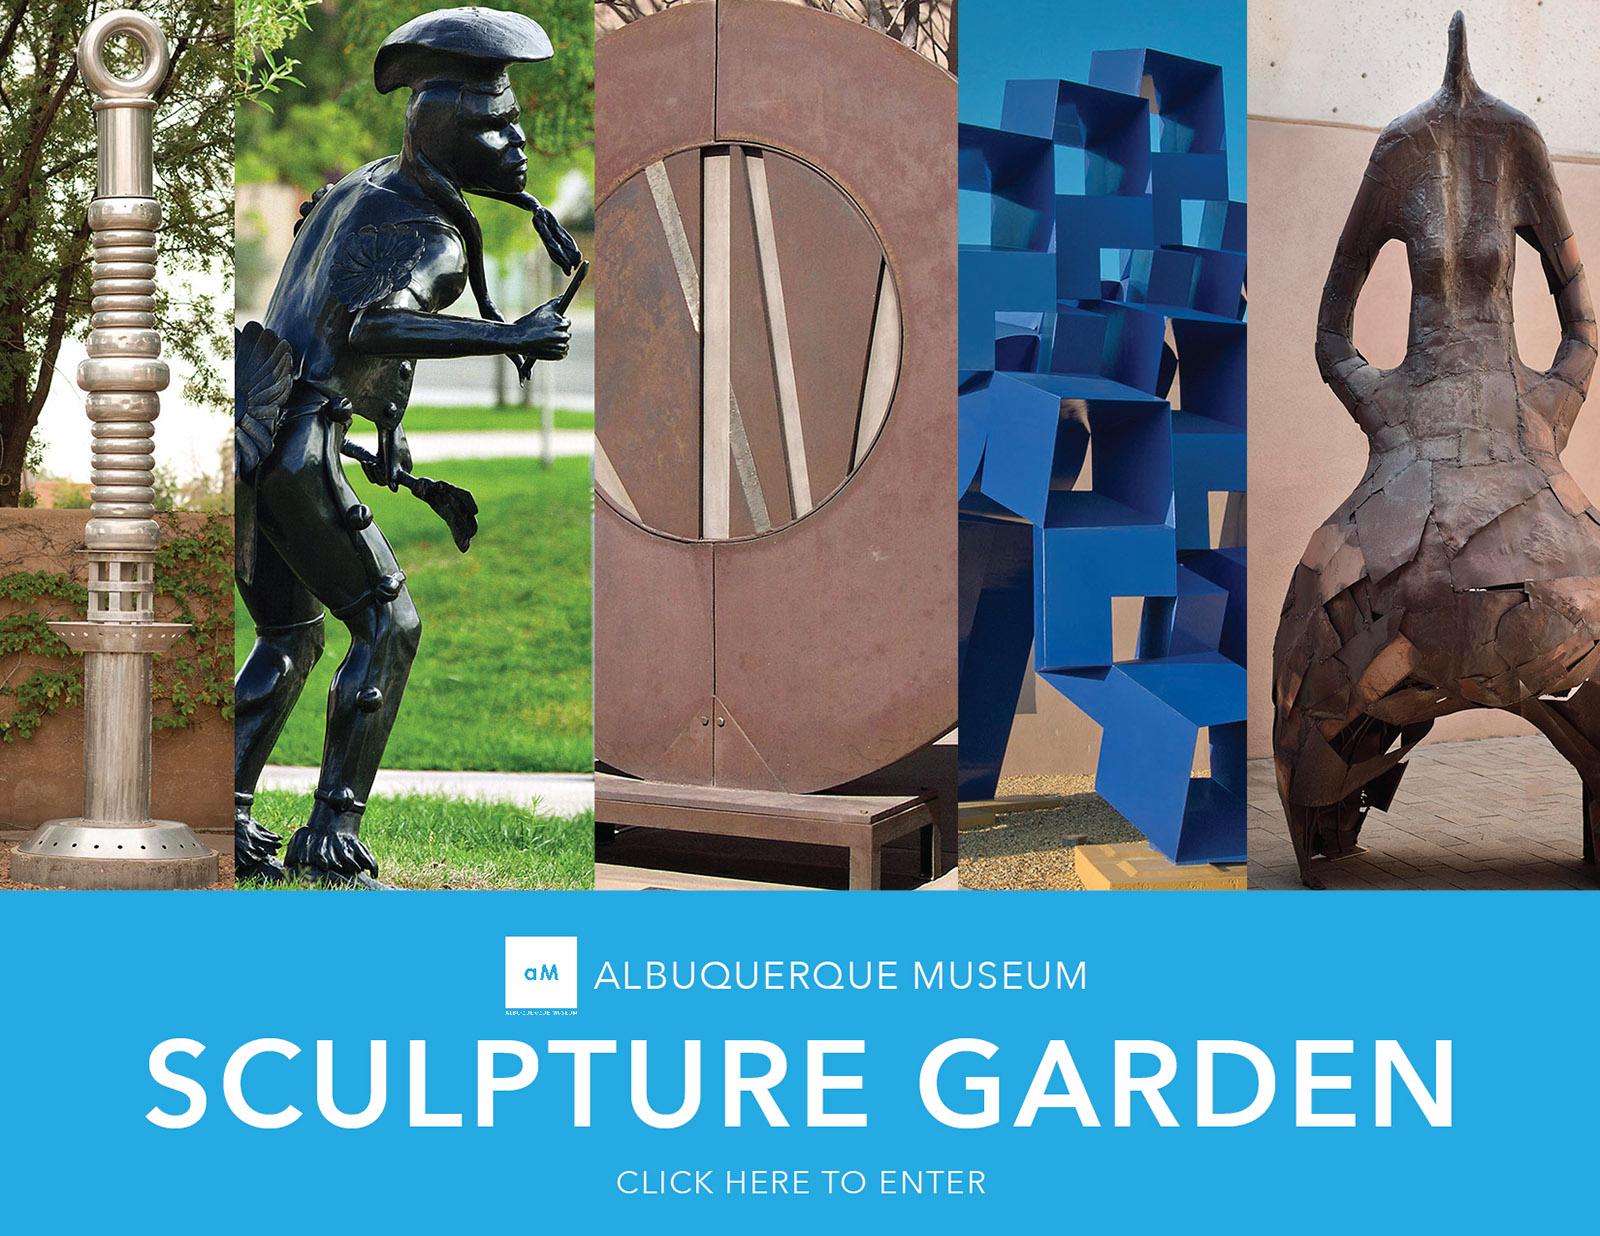 Sculpture Garden at the Albuquerque Museum